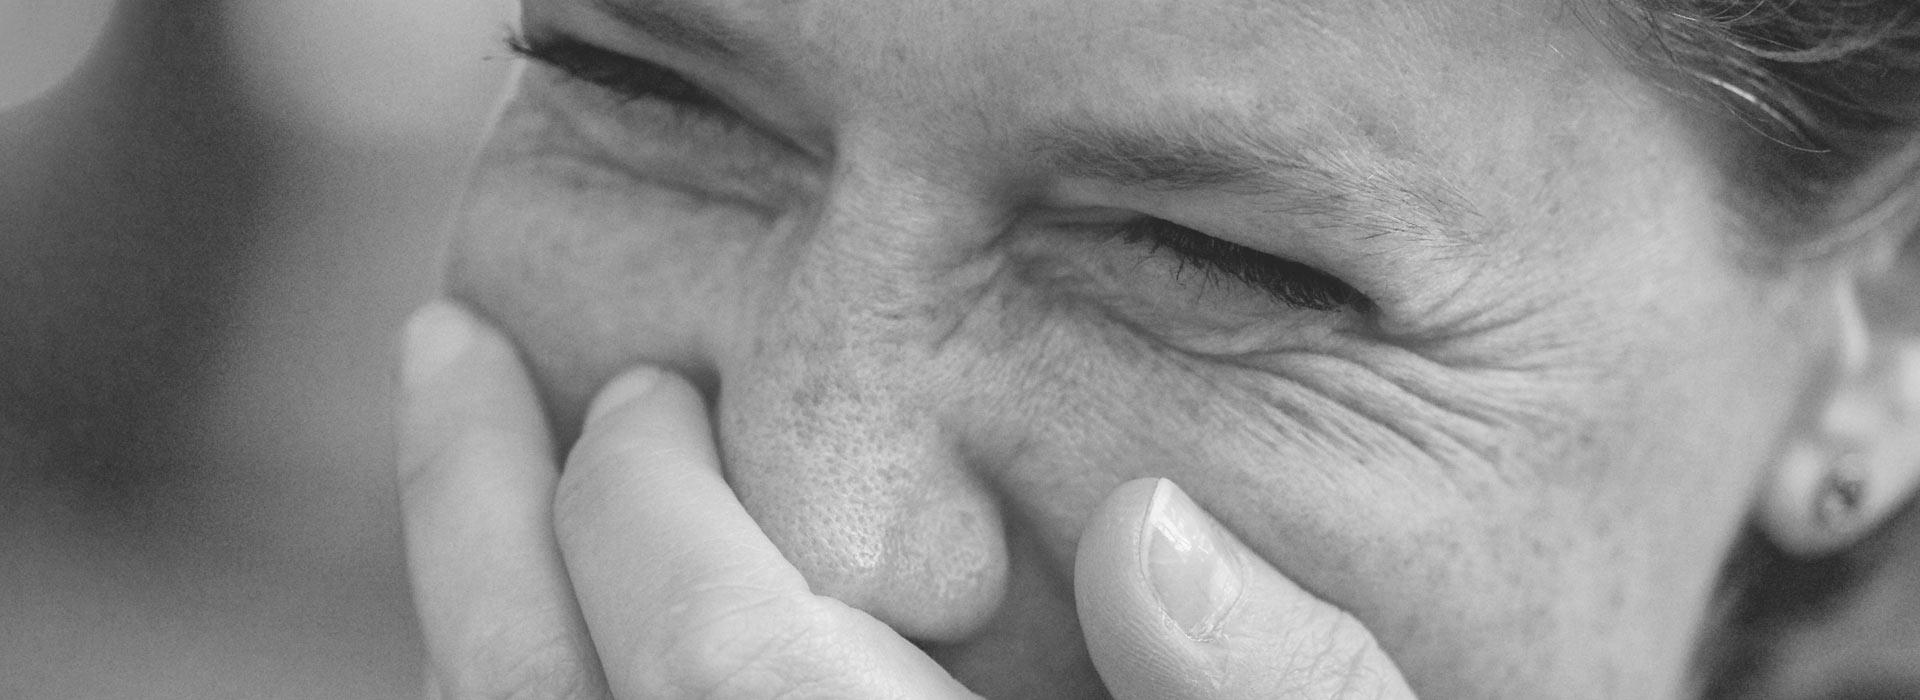 Parodontitisbehandlung Parodontose Parodontosebehandlung